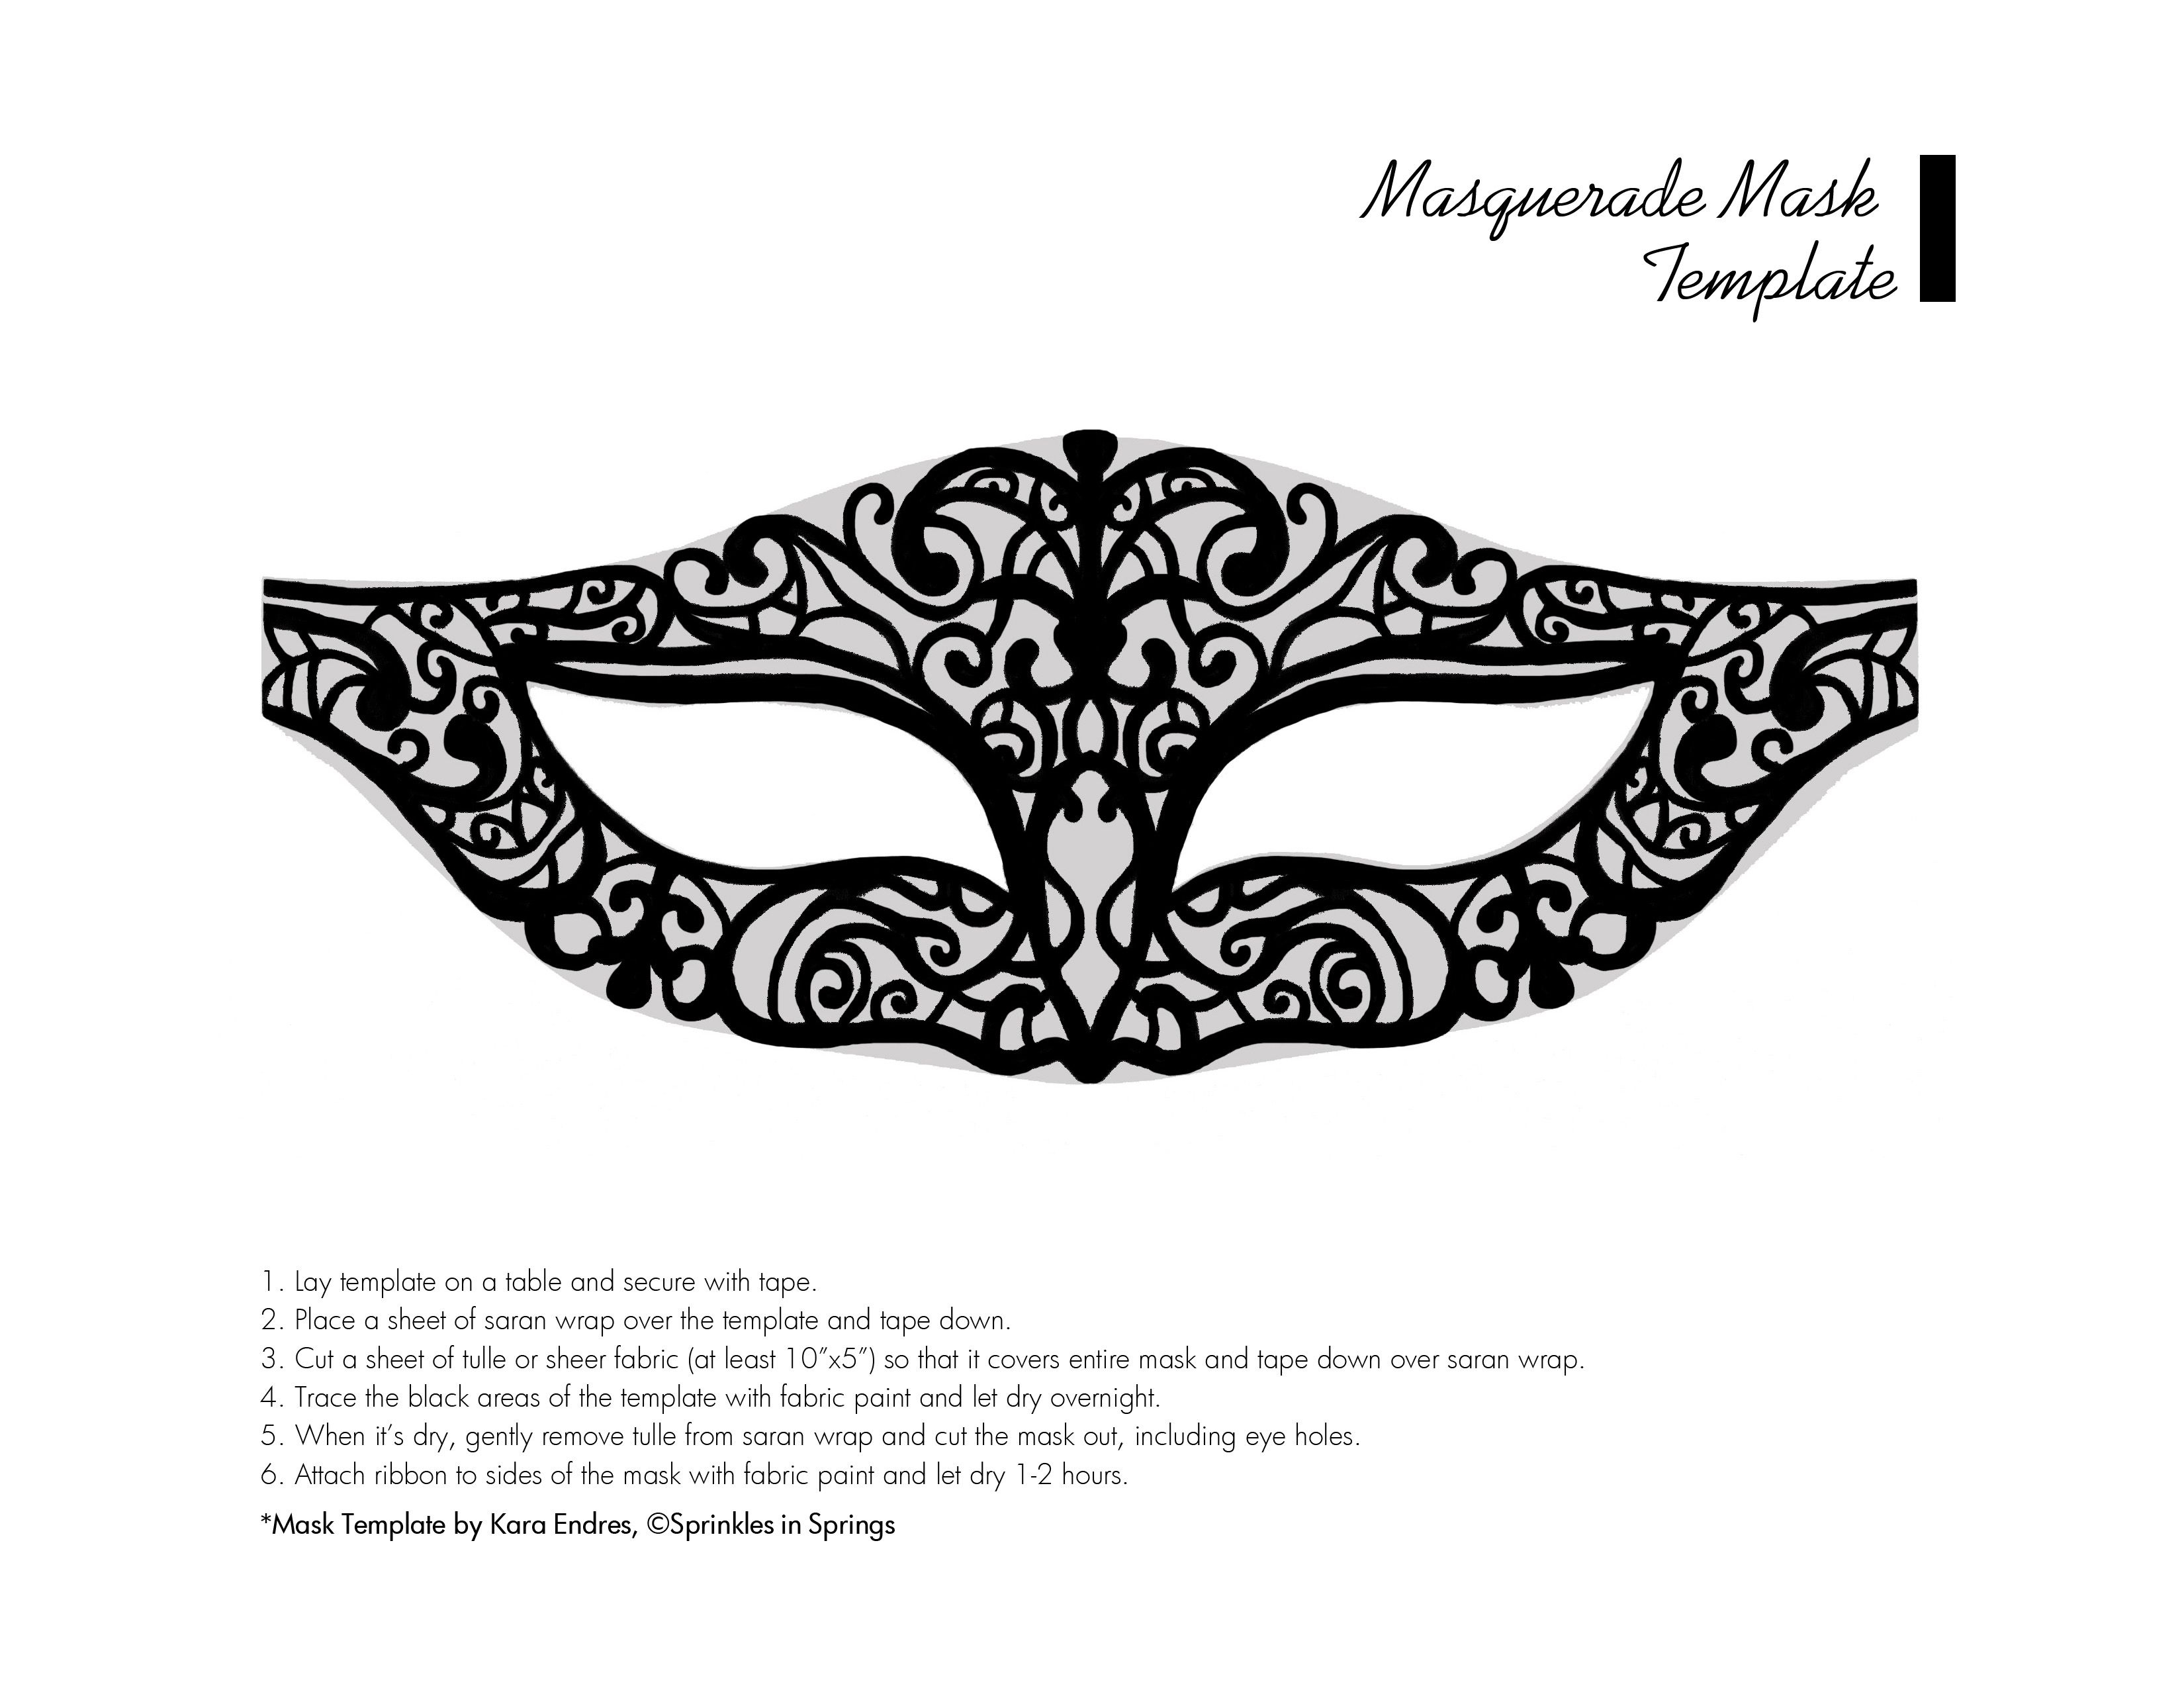 Free Printable Masquerade Masks - Babylon Yahoo! Search Results - Free Printable Masquerade Masks